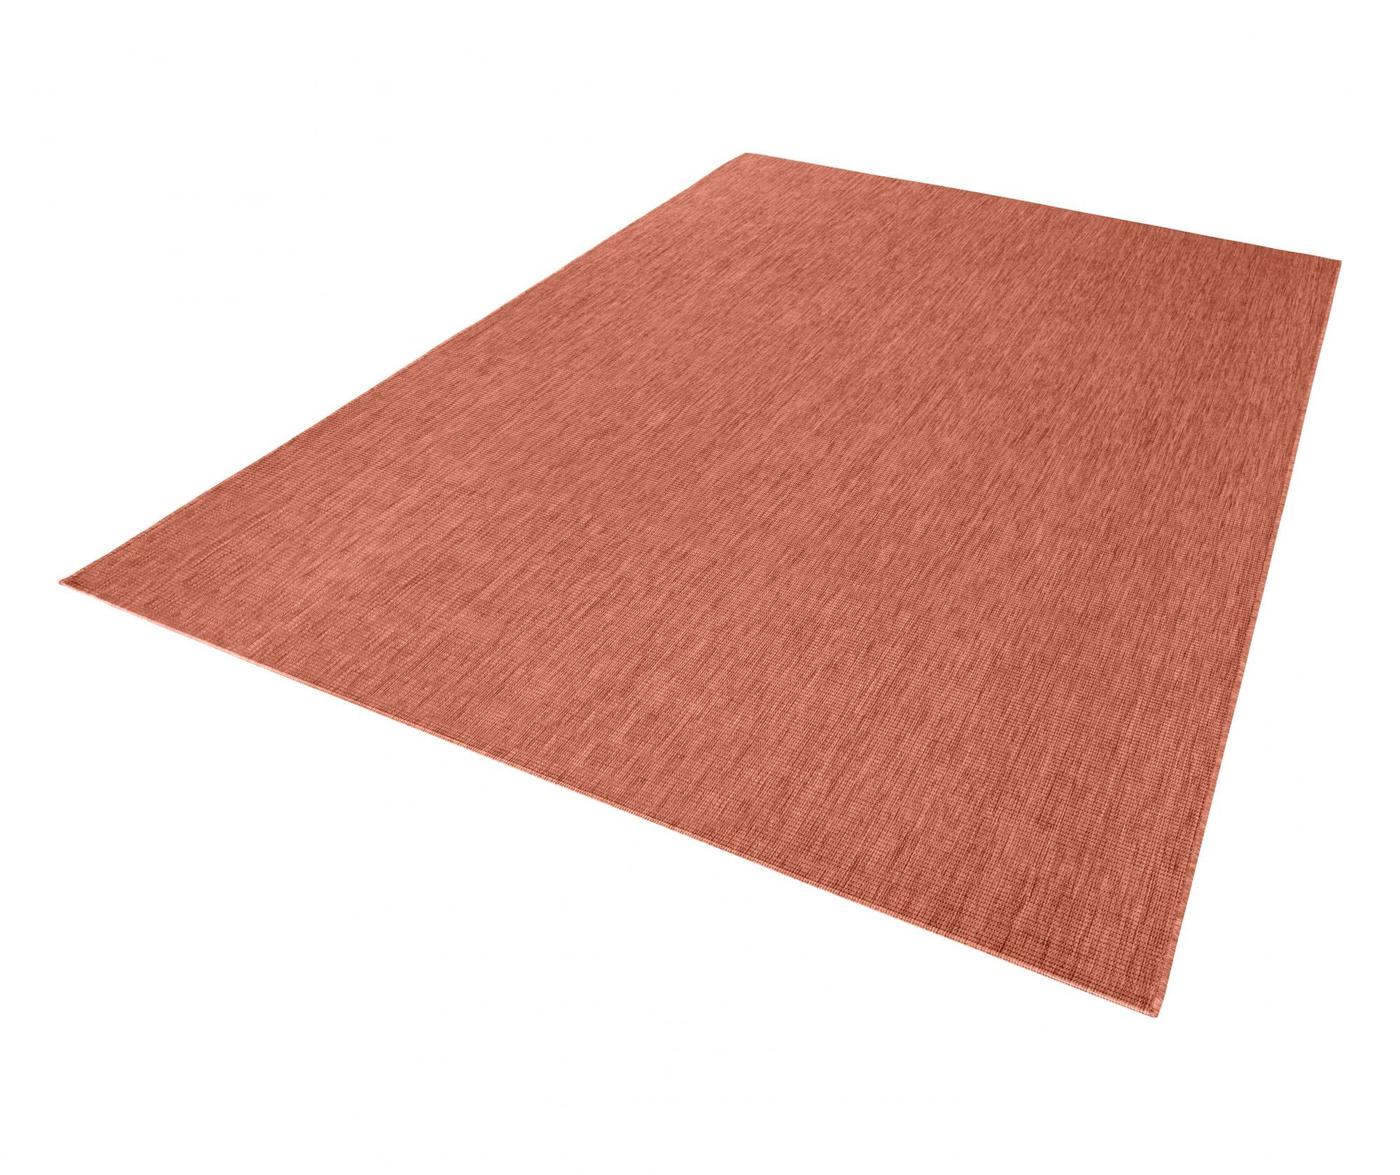 Covor de exterior Meadow Match Terracotta 120x170 cm